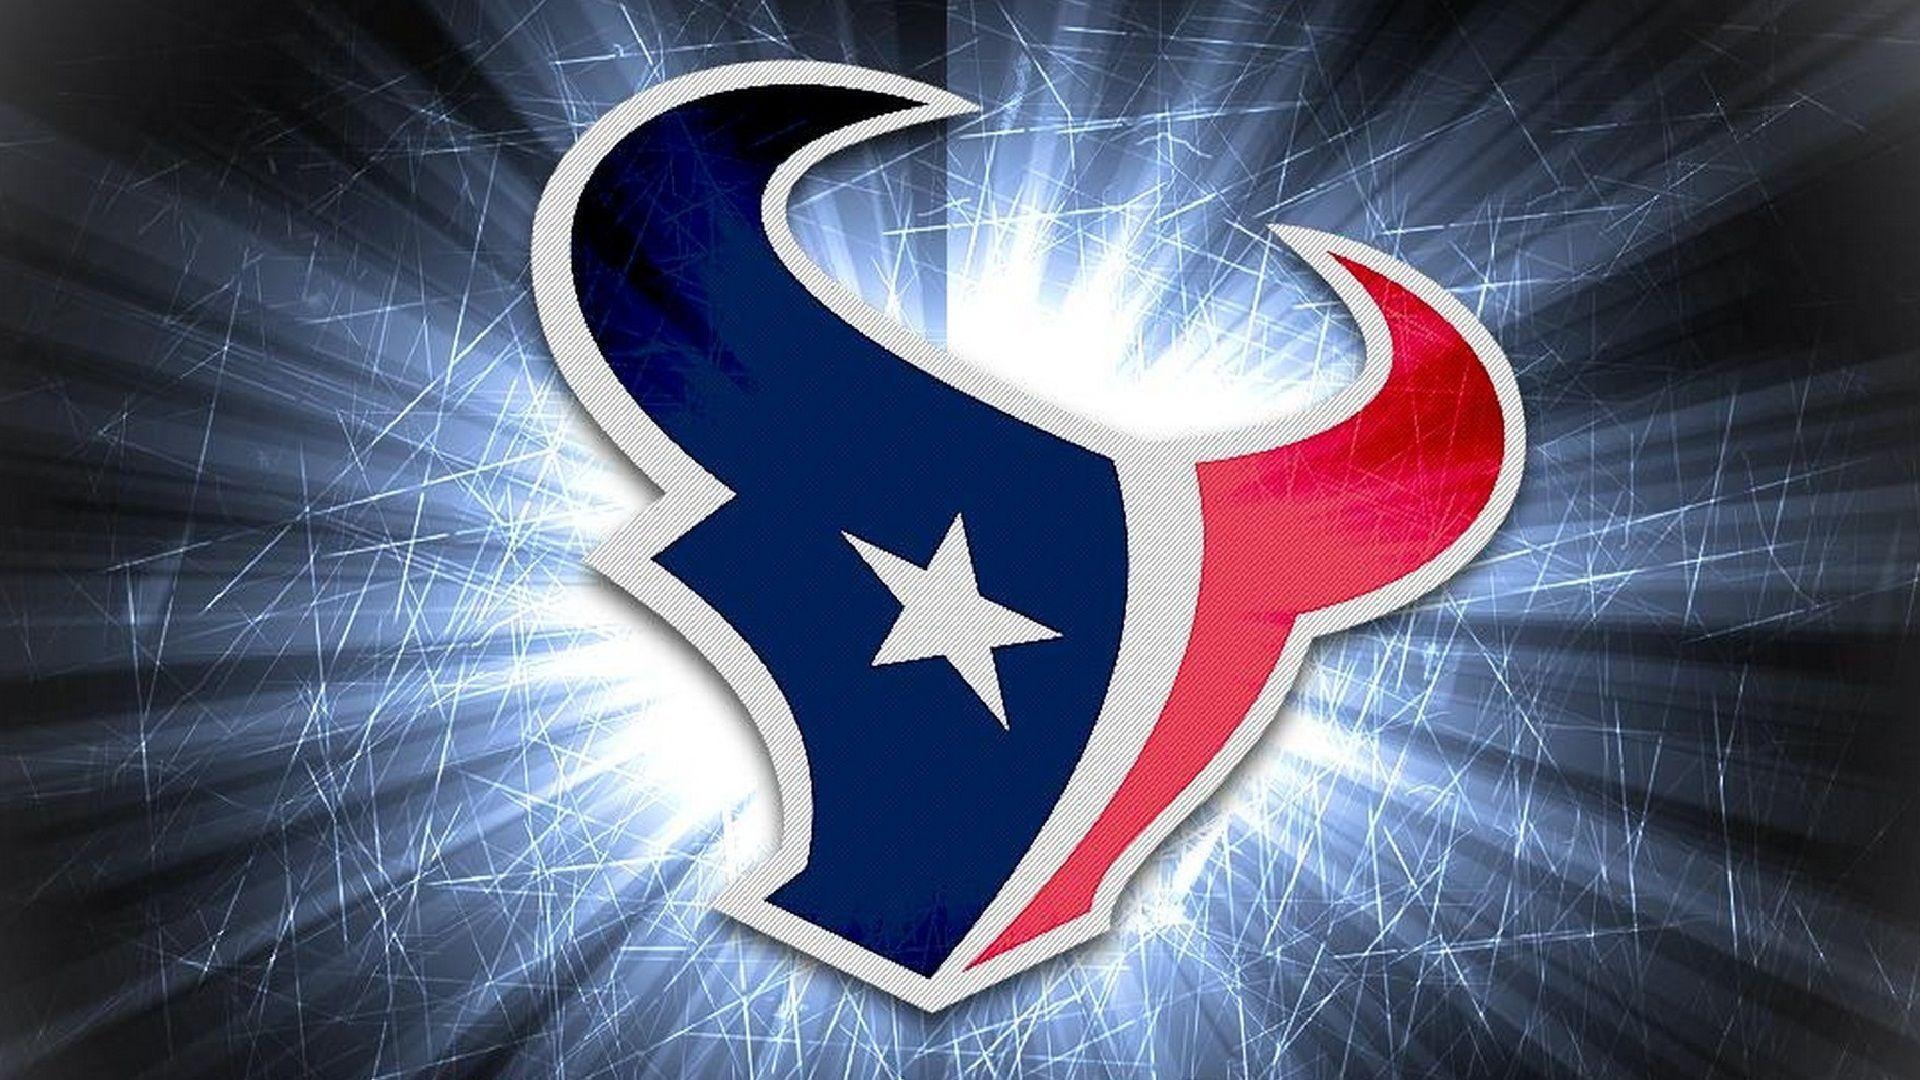 Texans Wallpapers Top Free Texans Backgrounds Wallpaperaccess